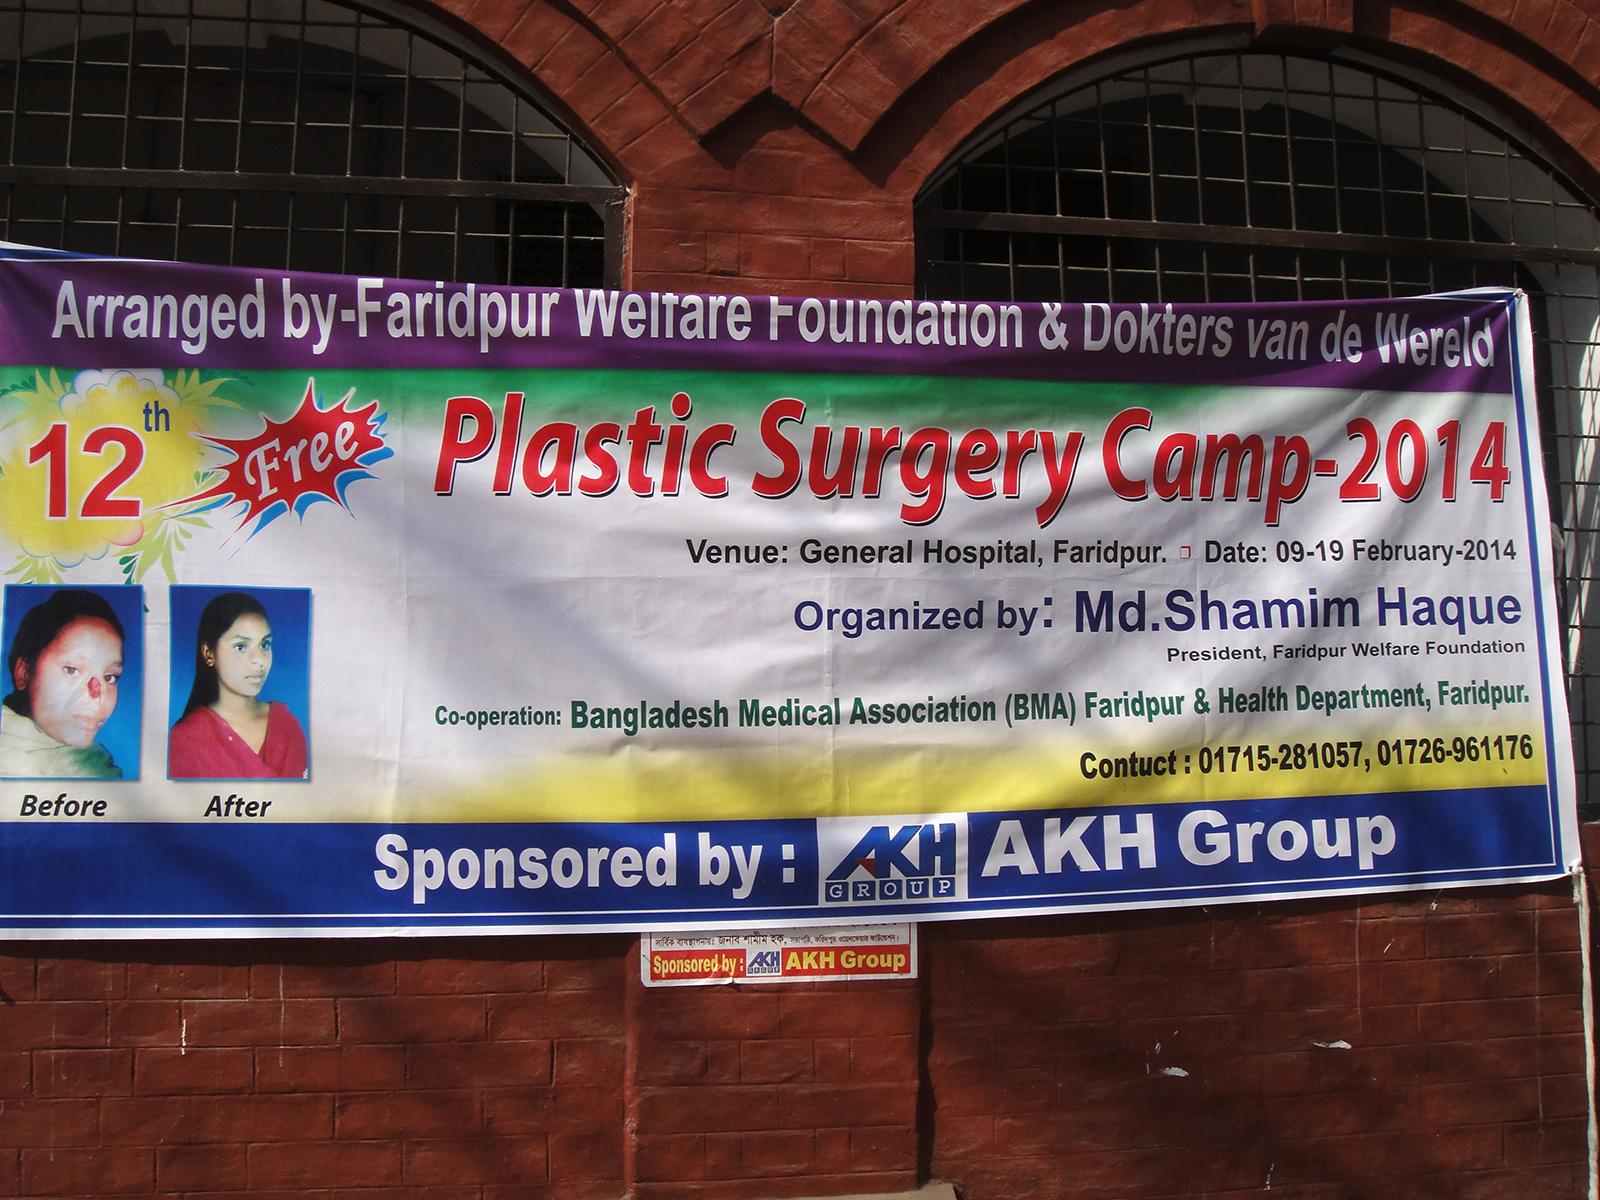 Affiche Pl.Surgery Camp Faridpur 2014